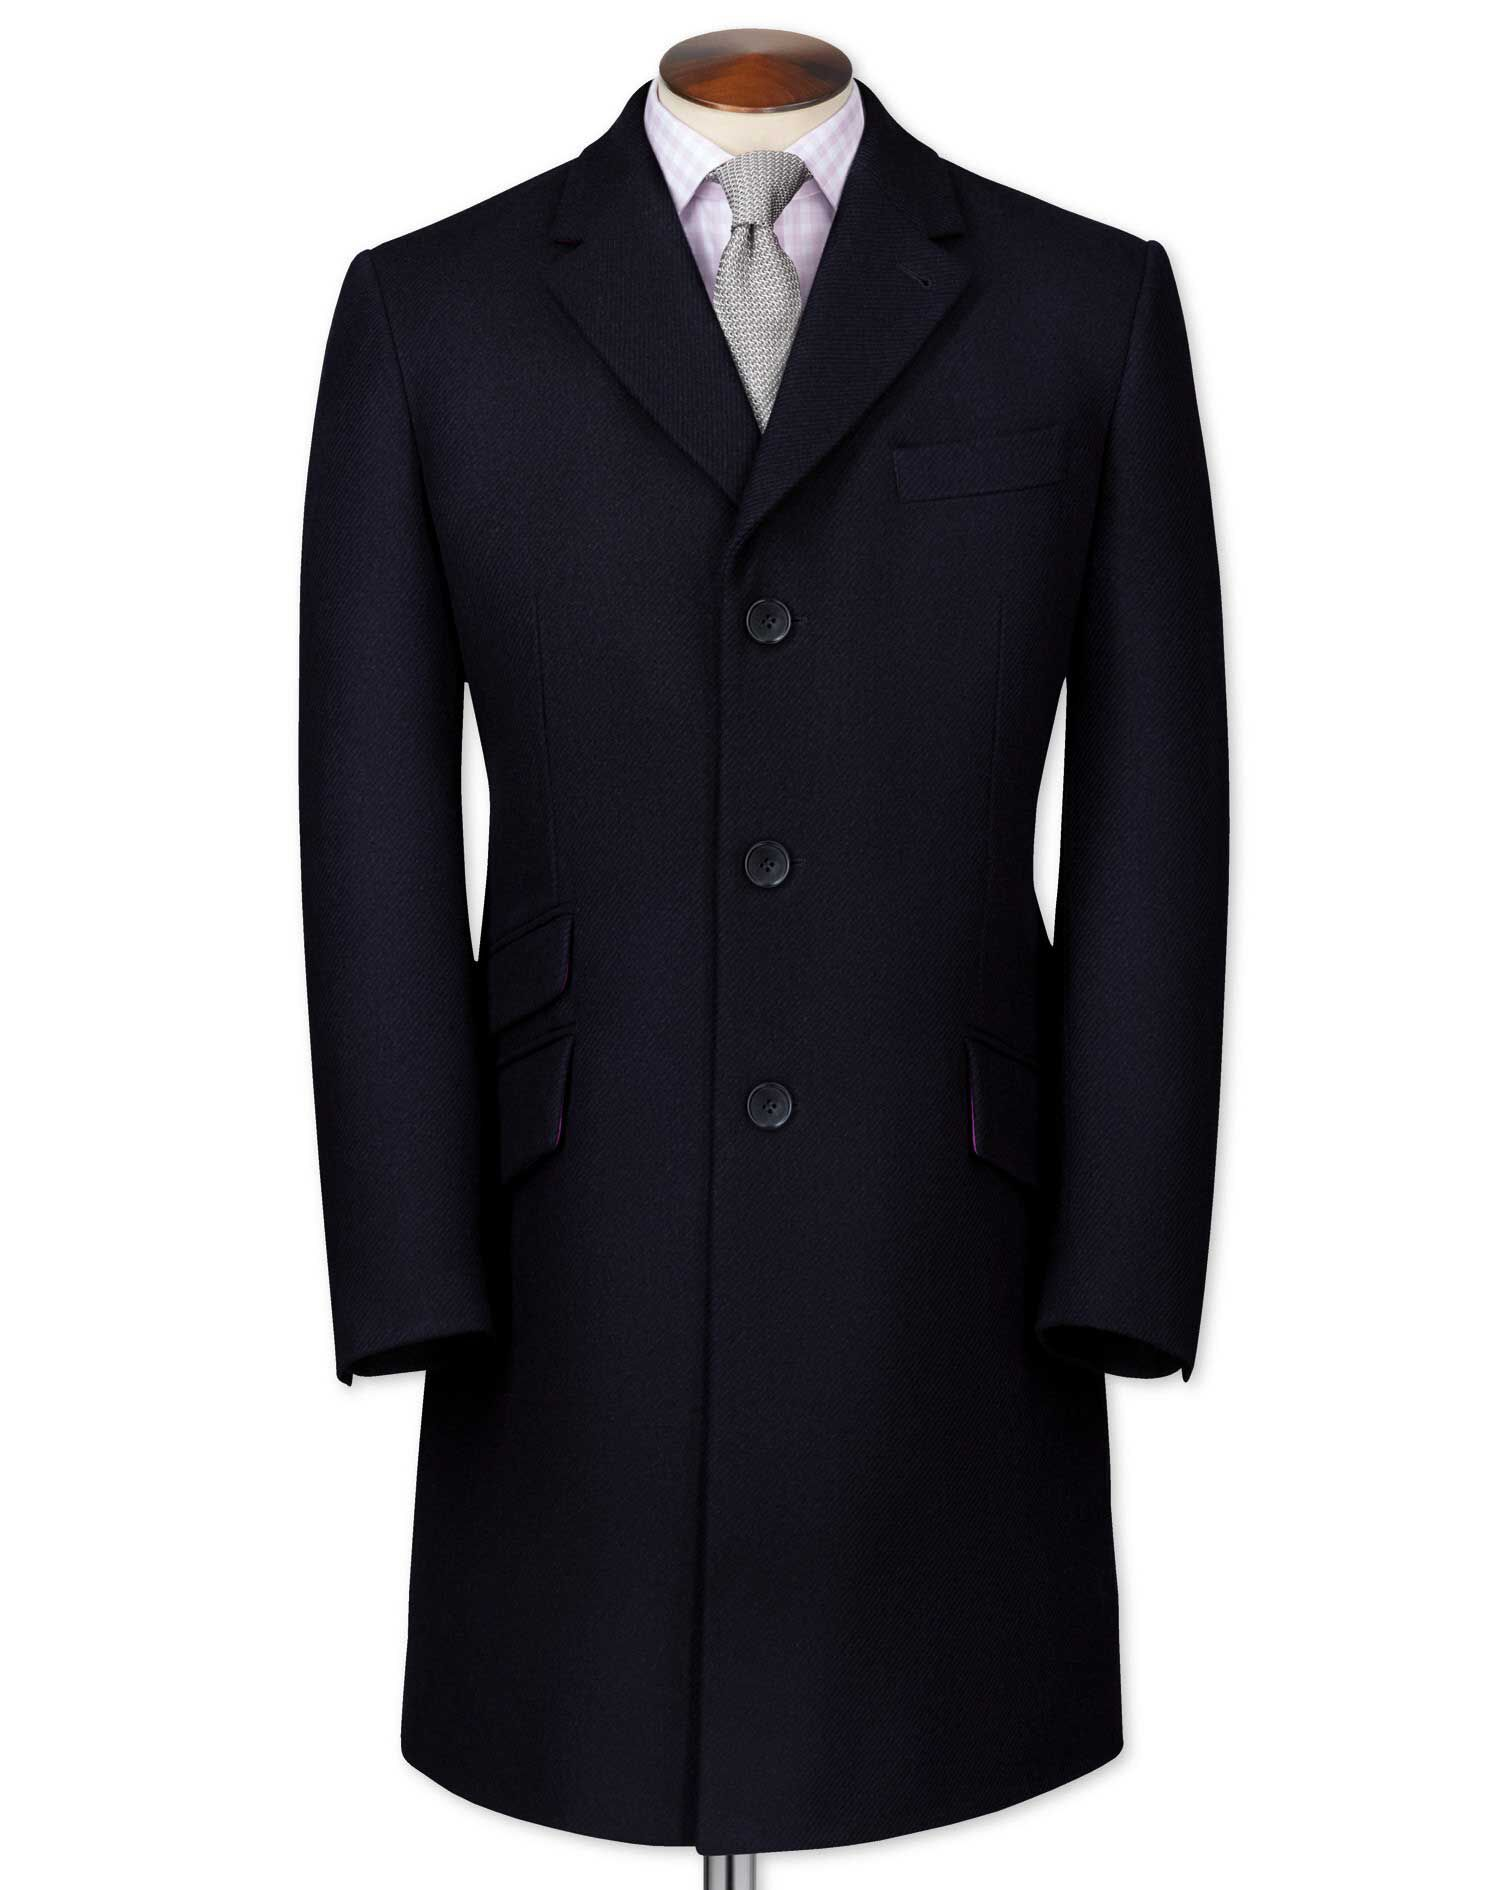 Men's Vintage Style Coats and Jackets Slim Fit Navy Wool Epsom OverWool coat Size 46 Regular by Charles Tyrwhitt £99.00 AT vintagedancer.com